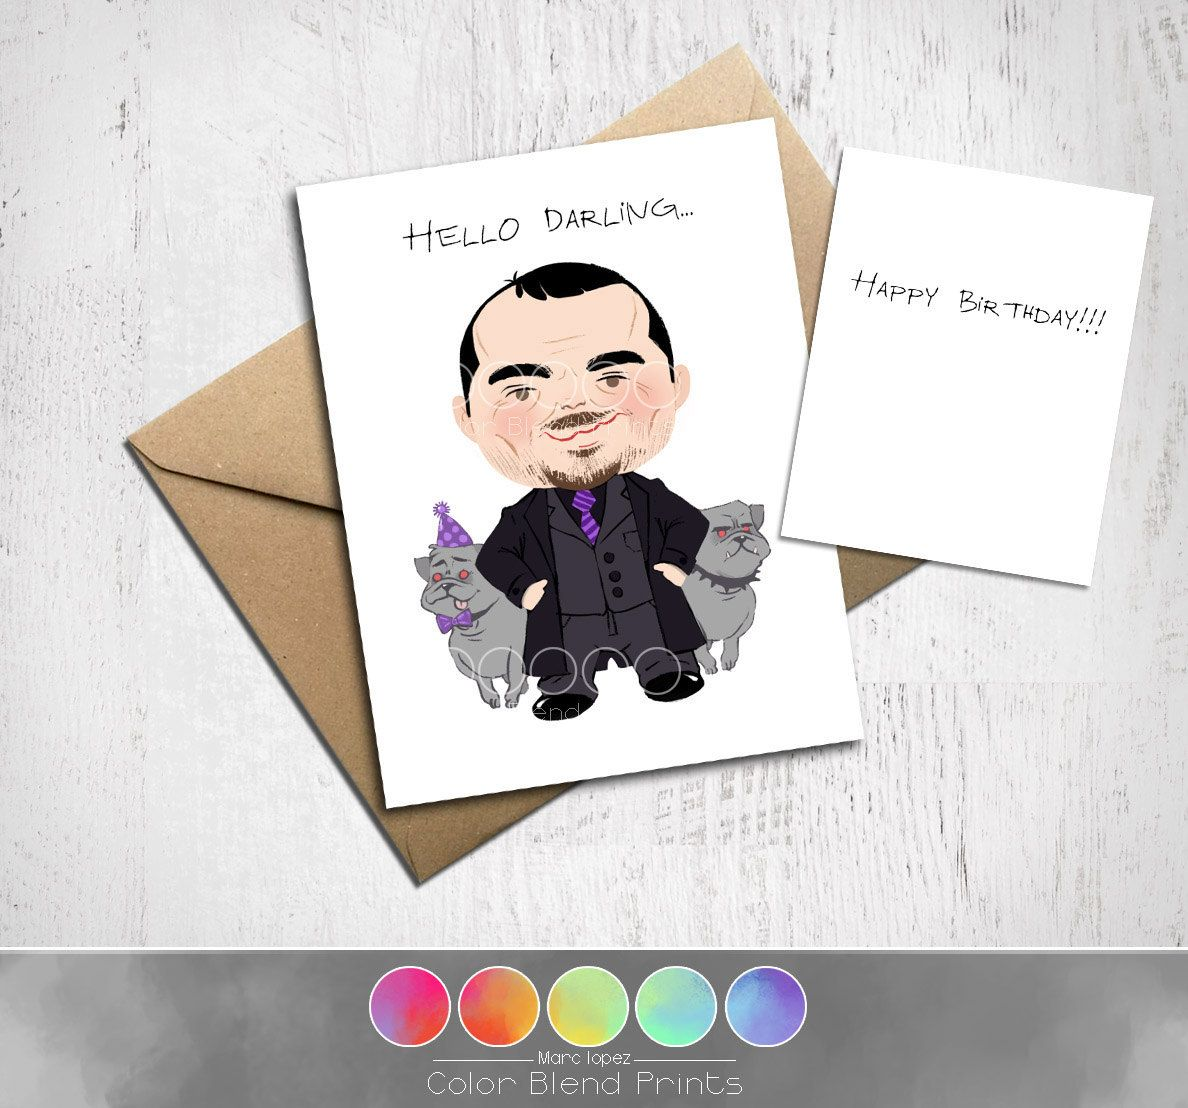 Supernatural Birthday Cards Birthday Gallery Birthday Card Sayings Dad Cards Dad Birthday Card